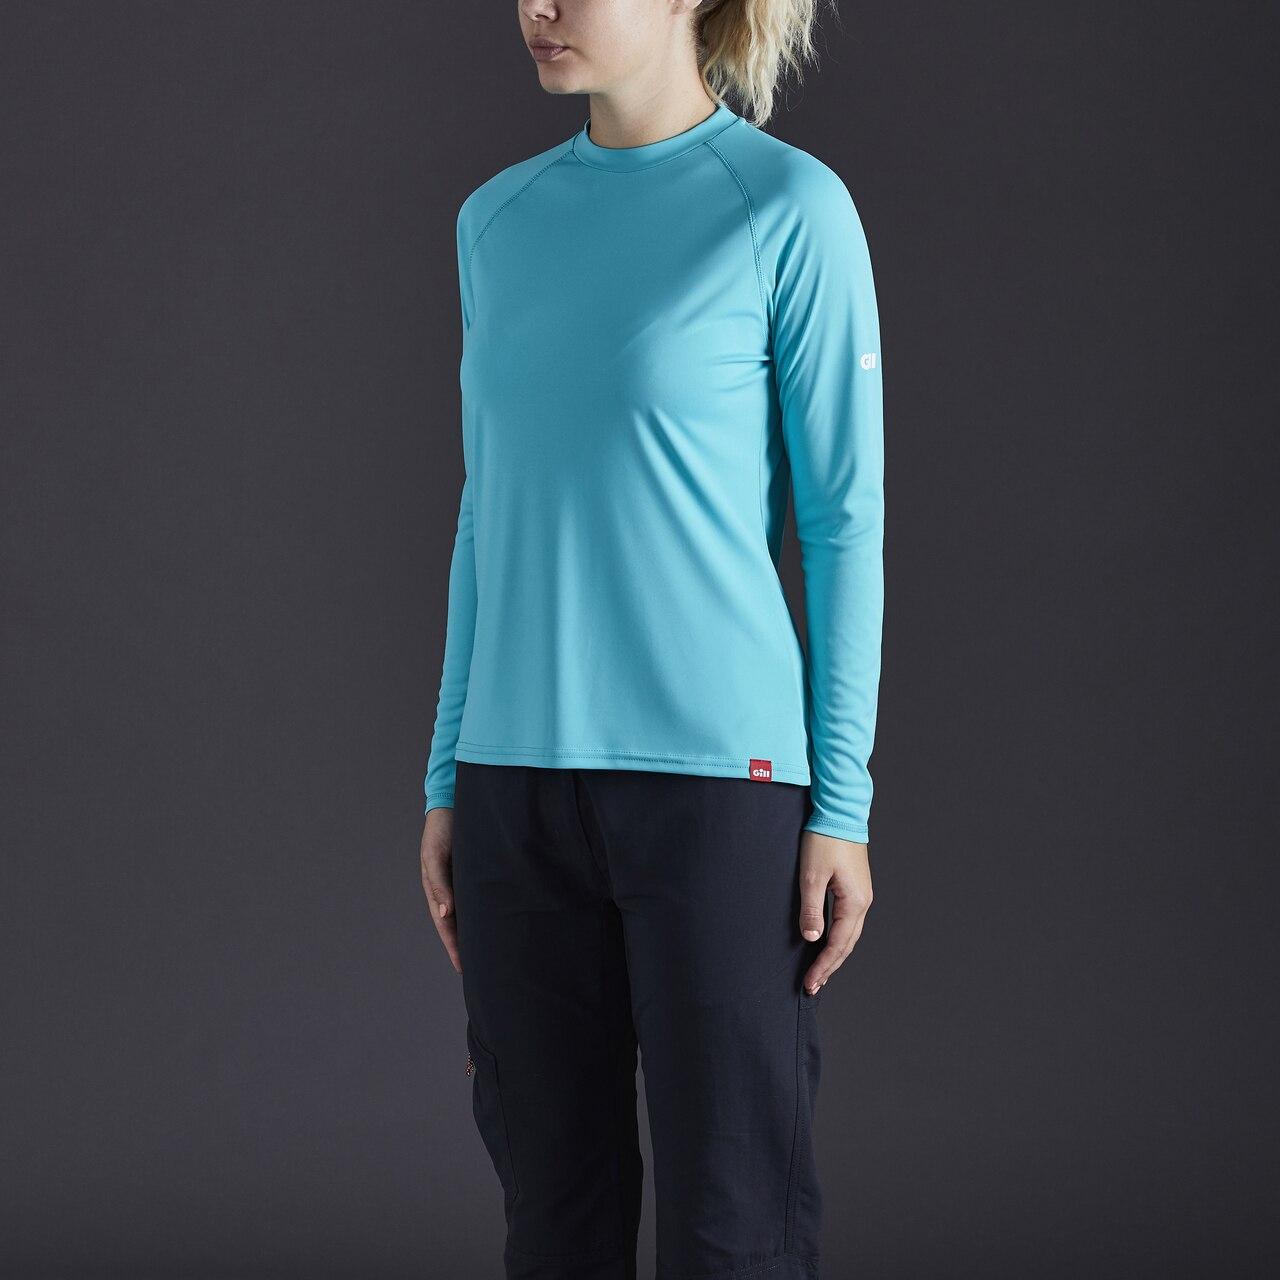 Women's UV Tec Long Sleeve Tee - UV011W-TUR02-MODEL-1.jpg